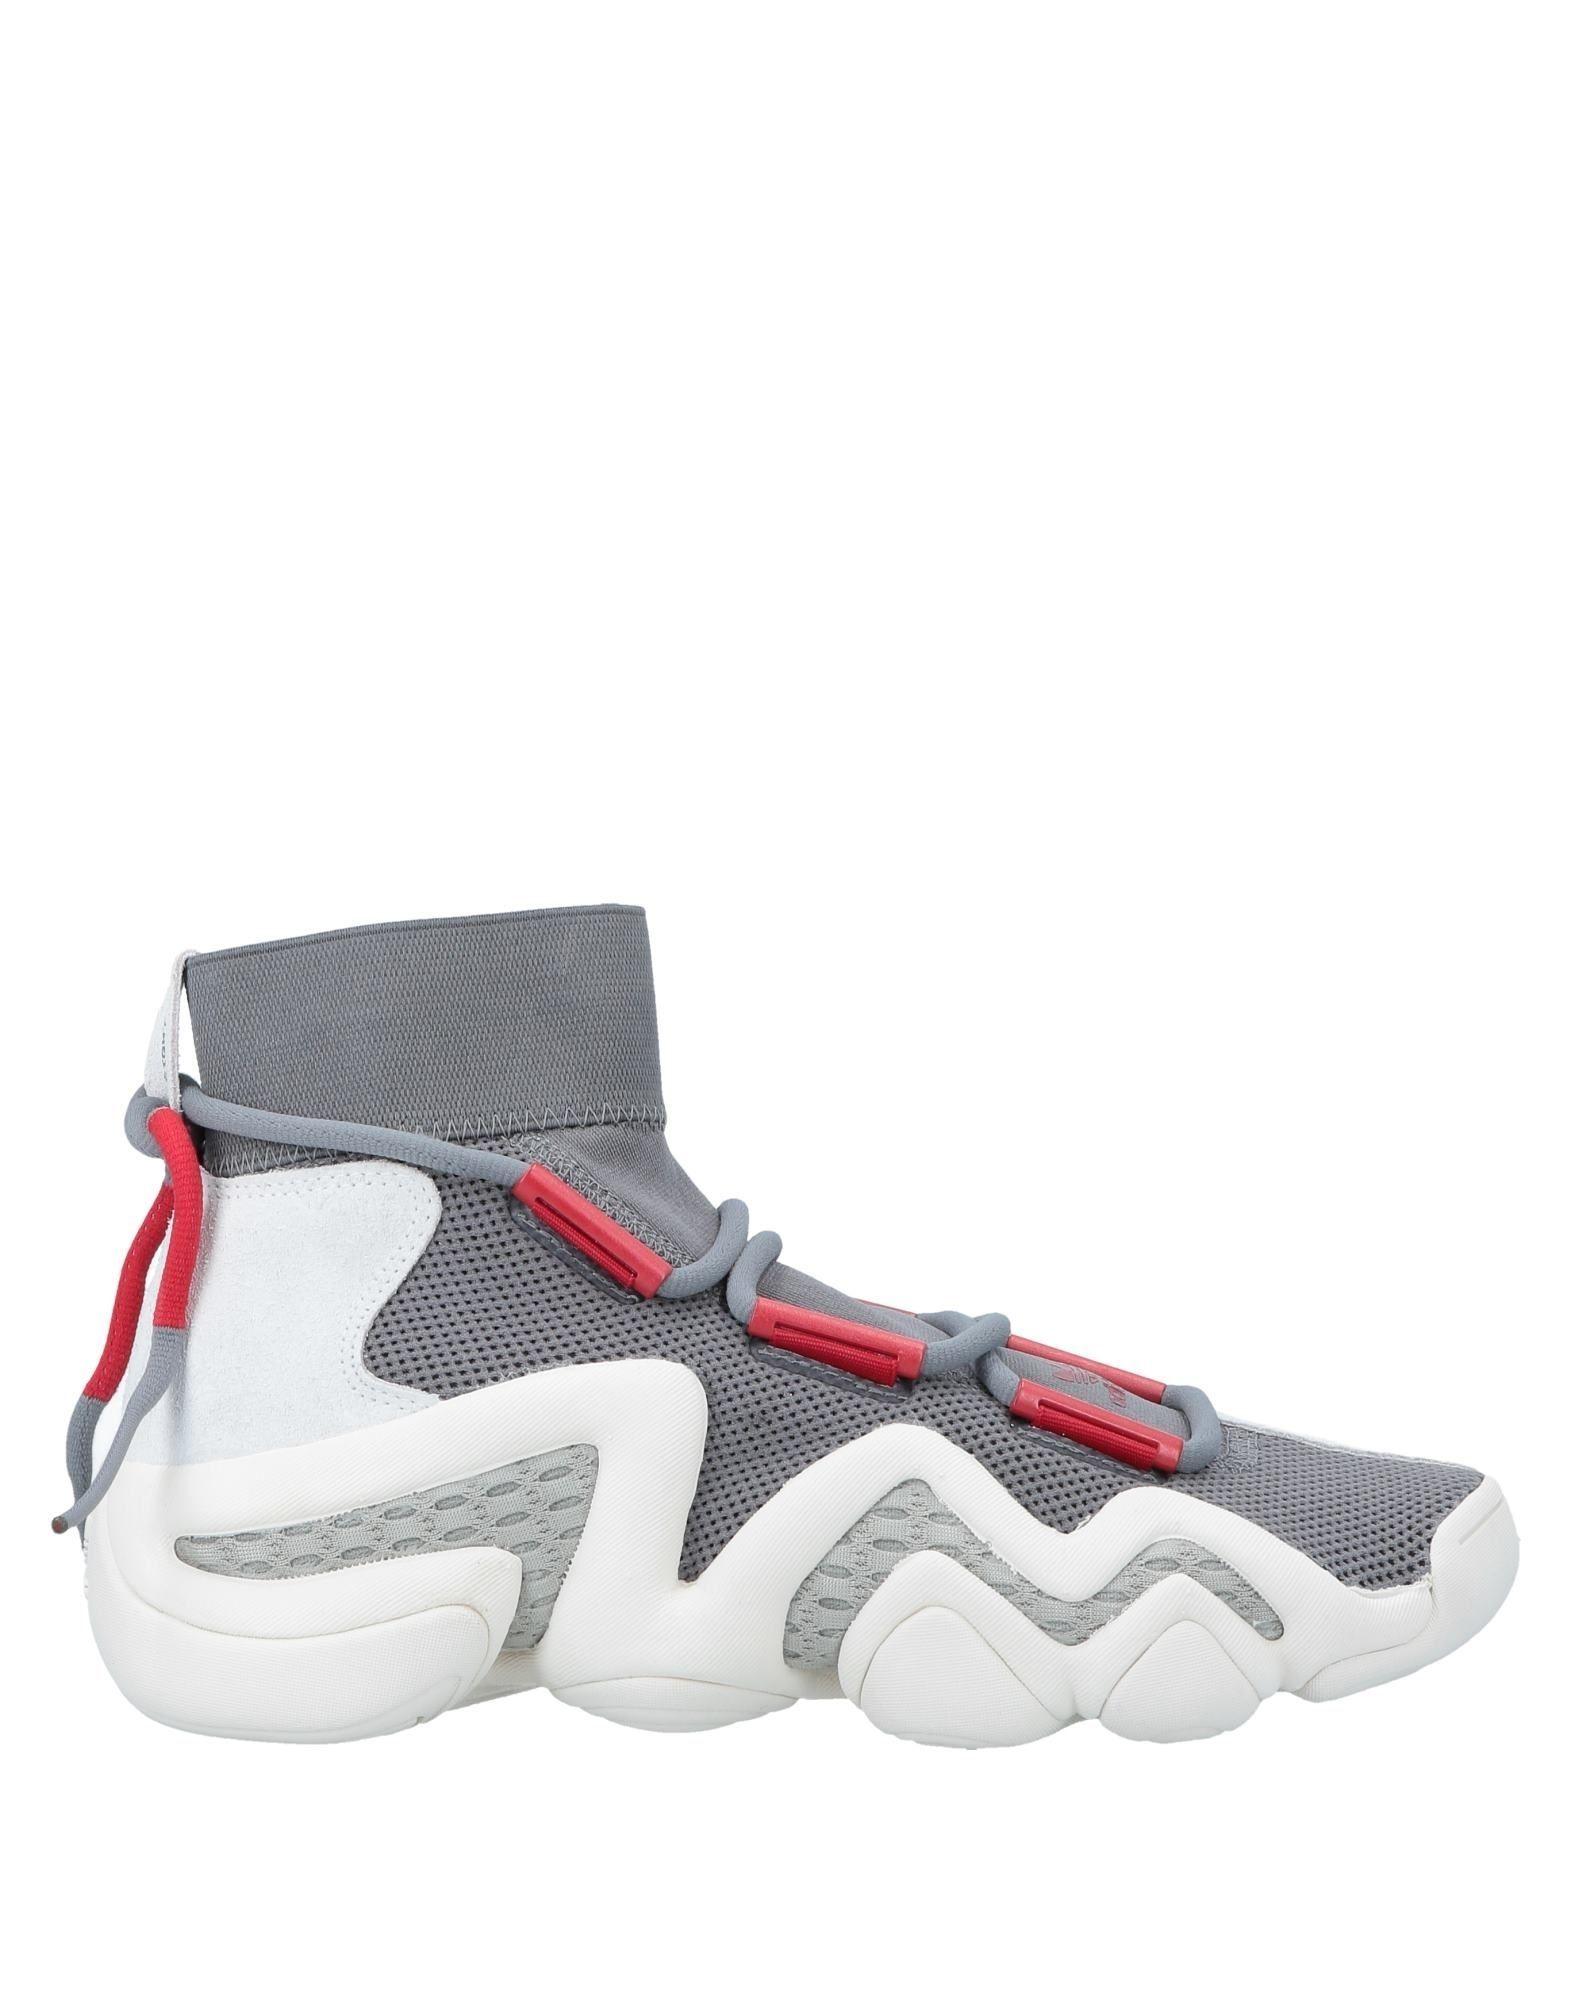 reputable site f1510 8207d ADIDAS ORIGINALS SNEAKERS.  adidasoriginals  shoes